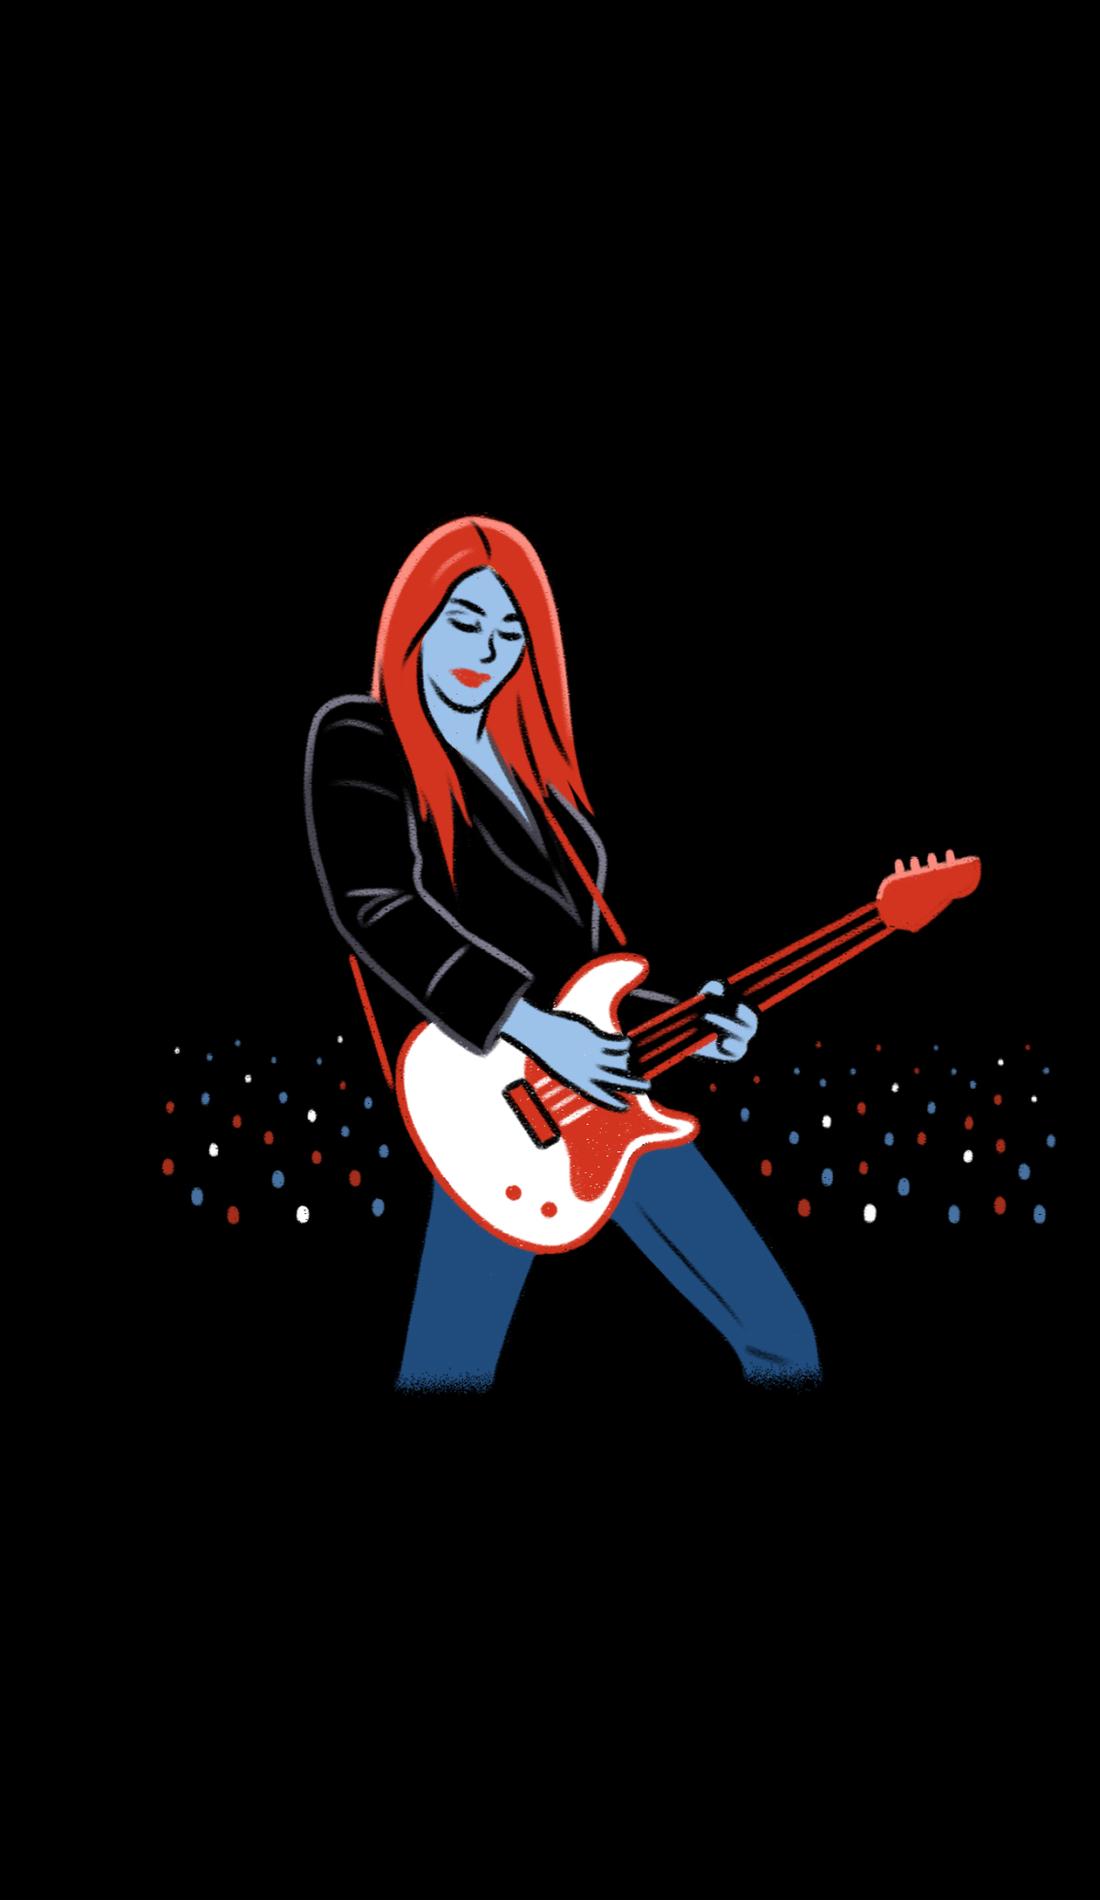 A Live - Band live event